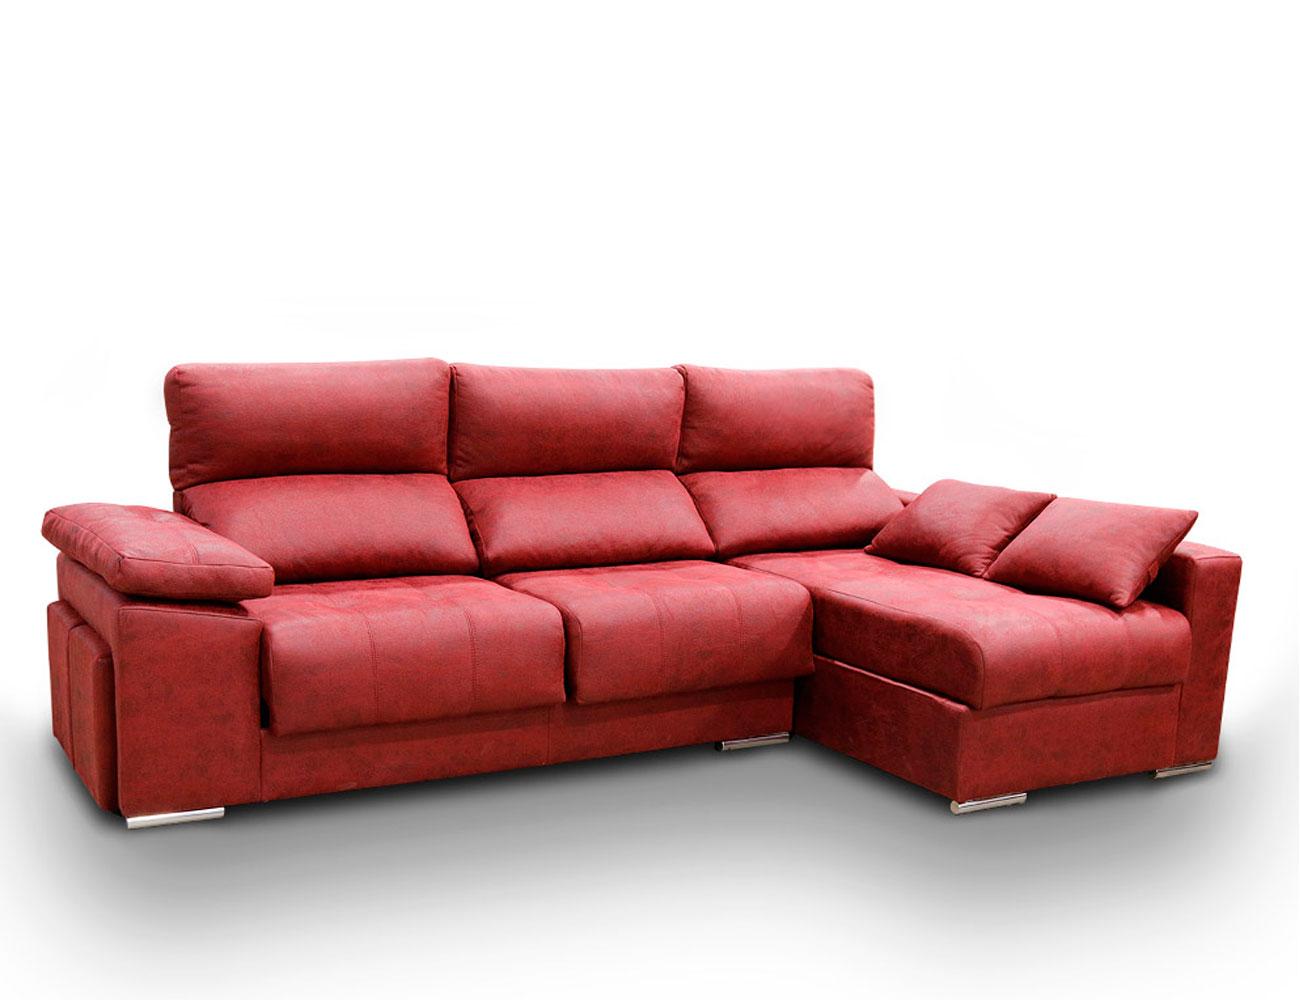 Sofa chaiselongue anti manchas rojo granate1